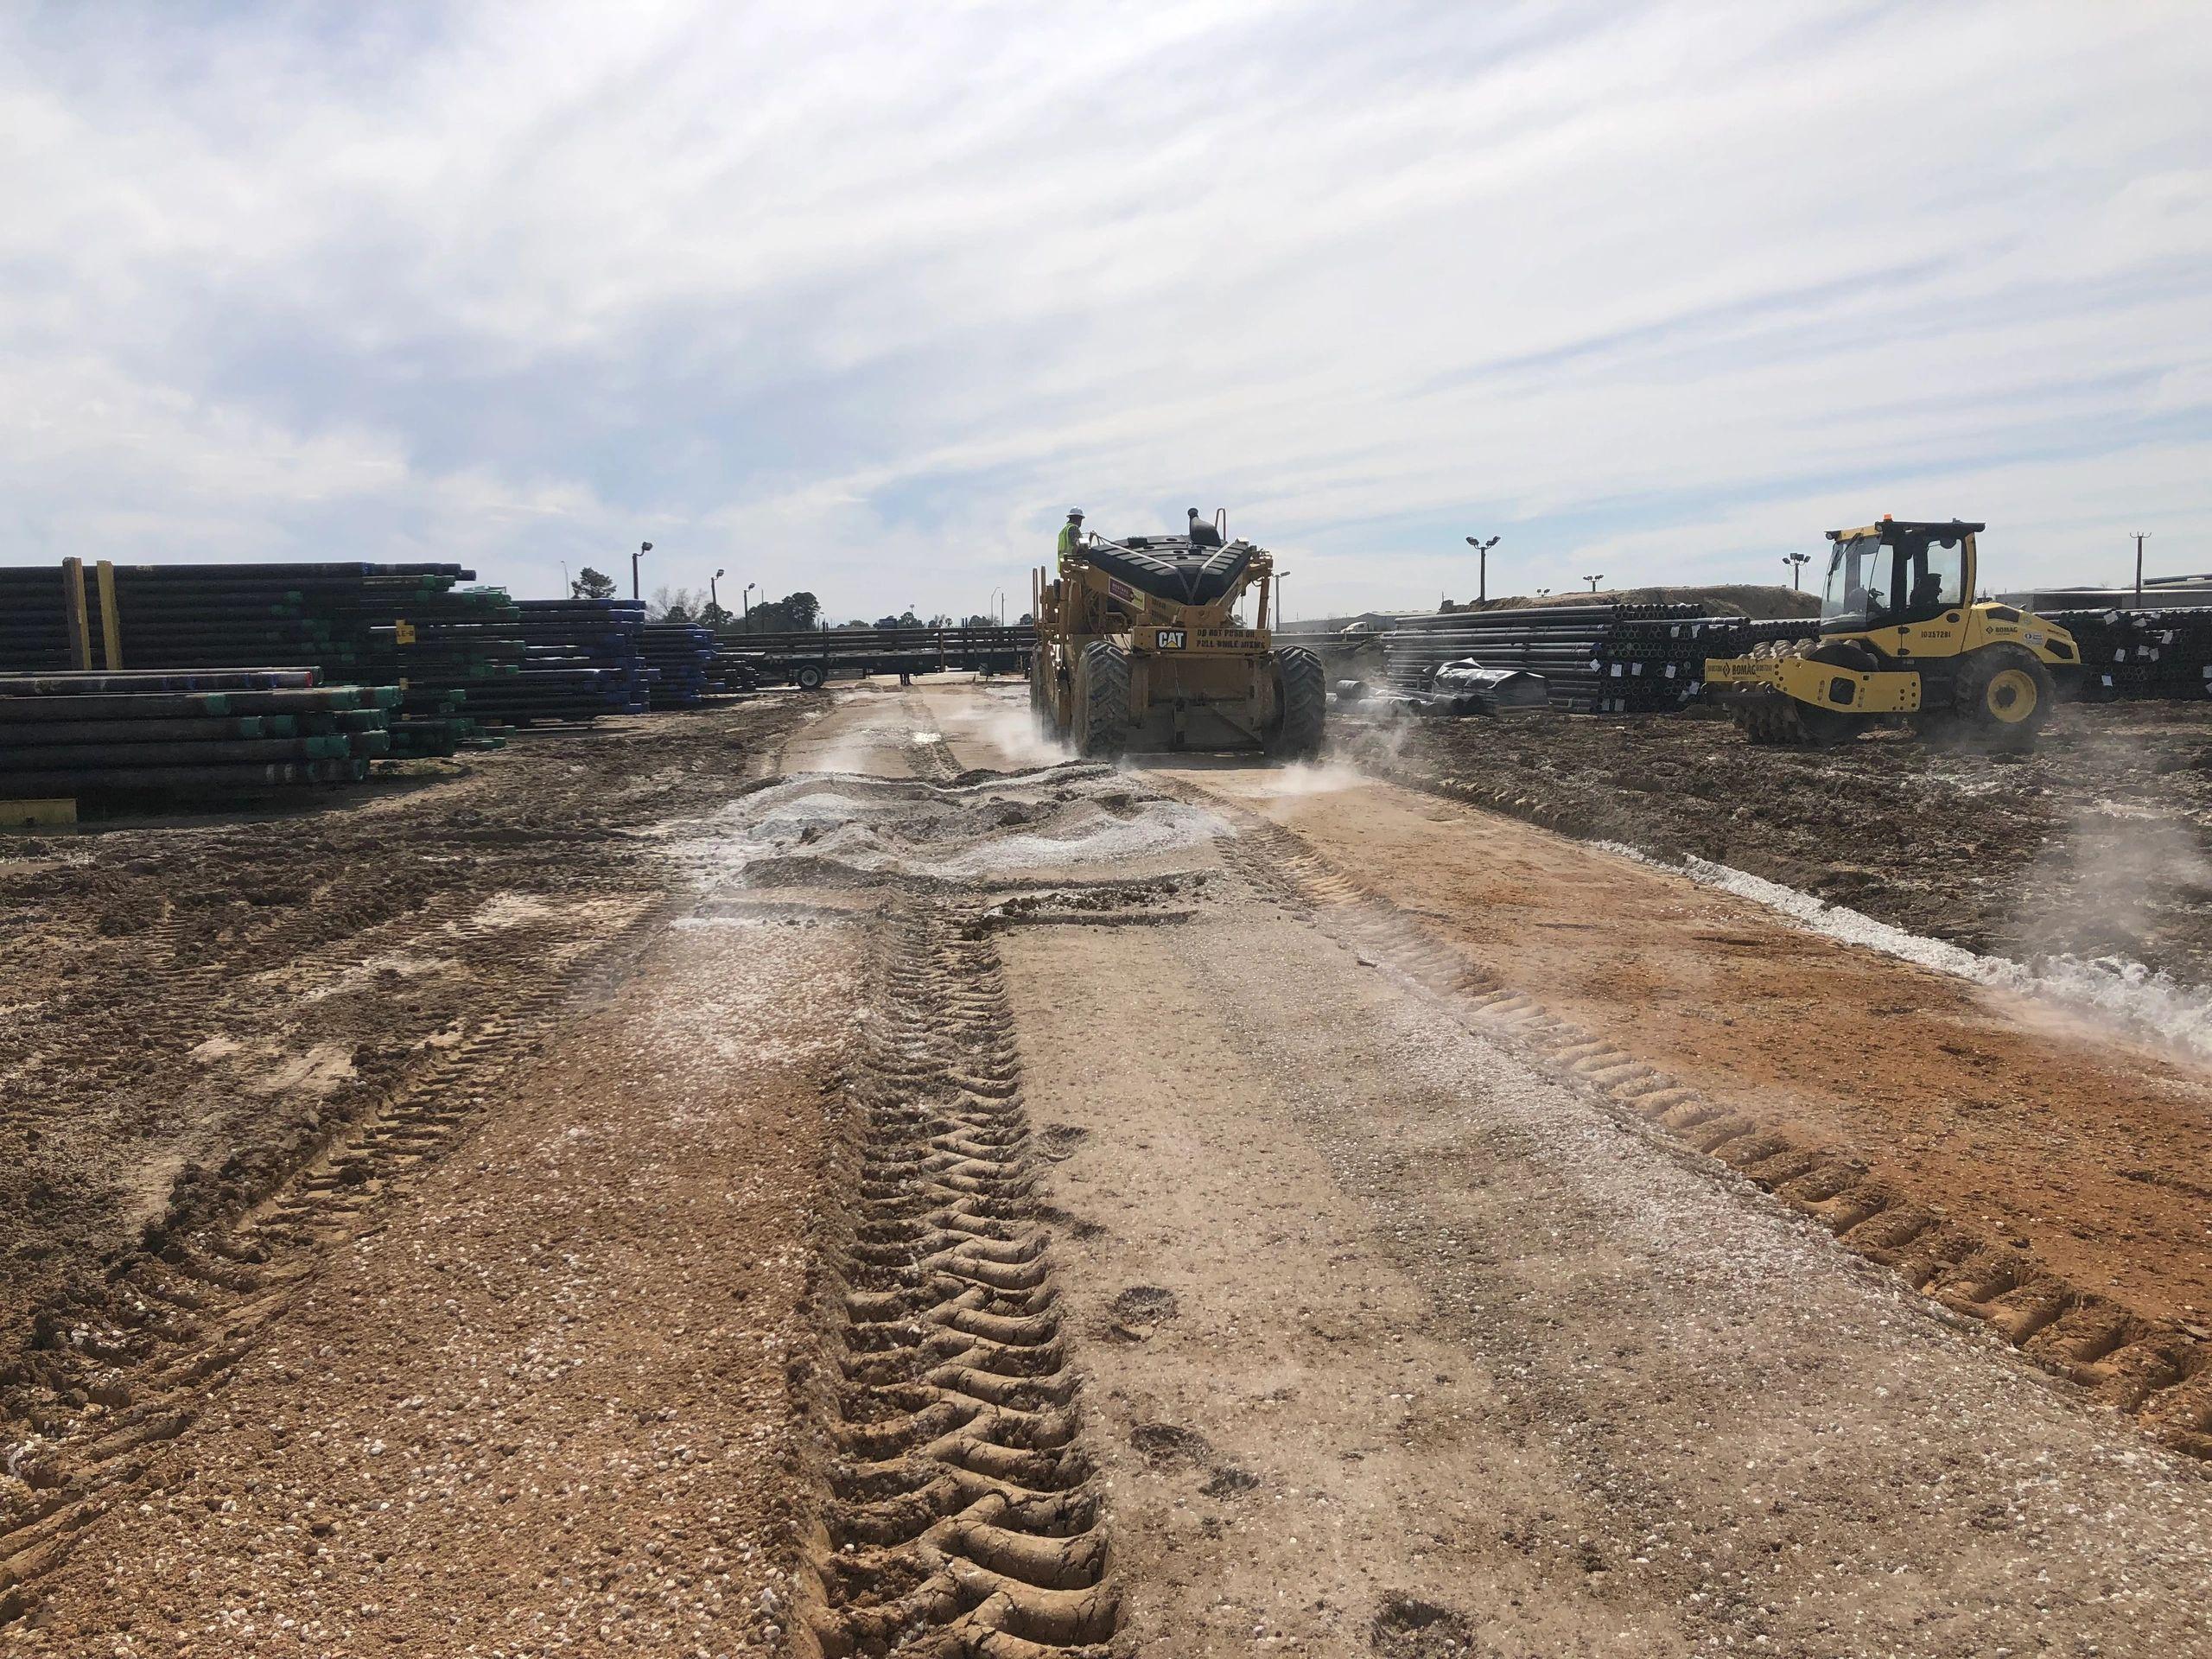 Jnl Construction Llc Construction Company Site Work Excavator